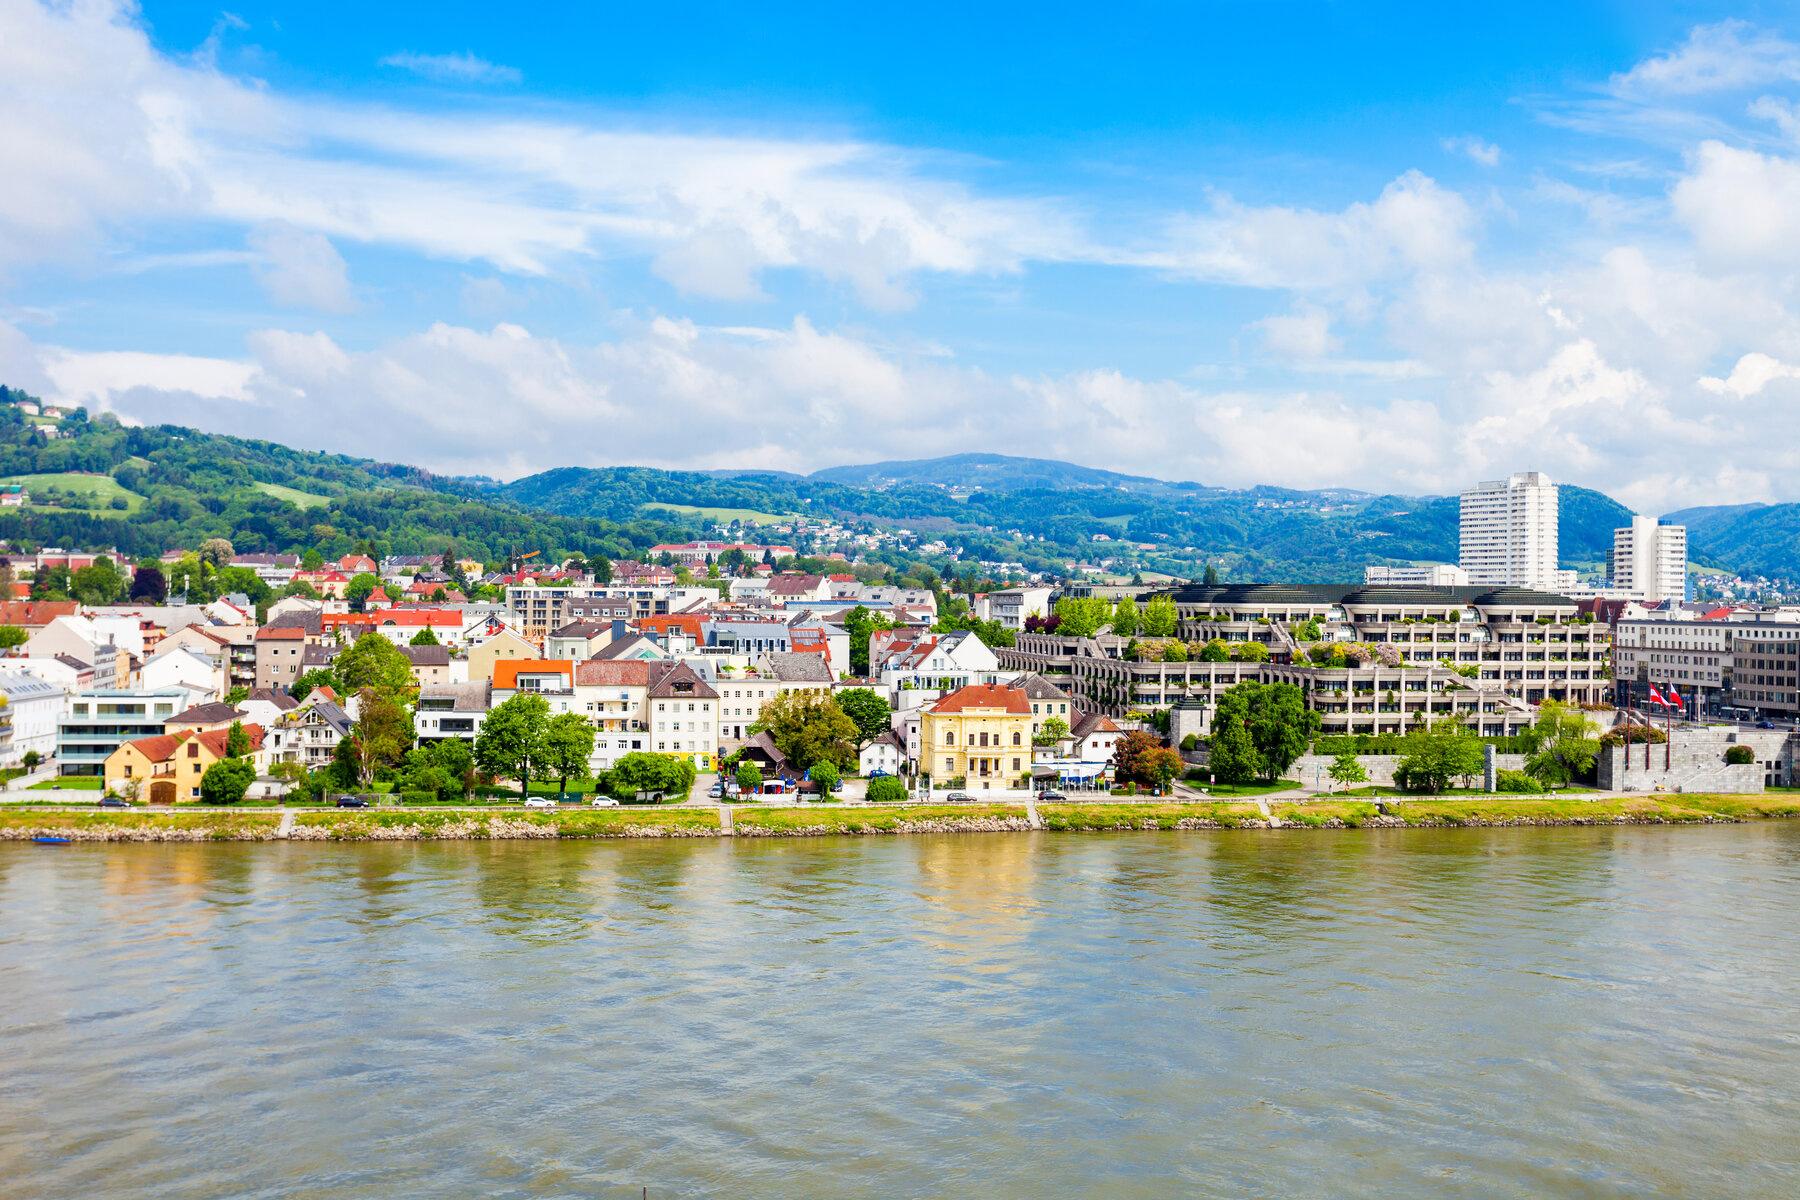 Linz skyline